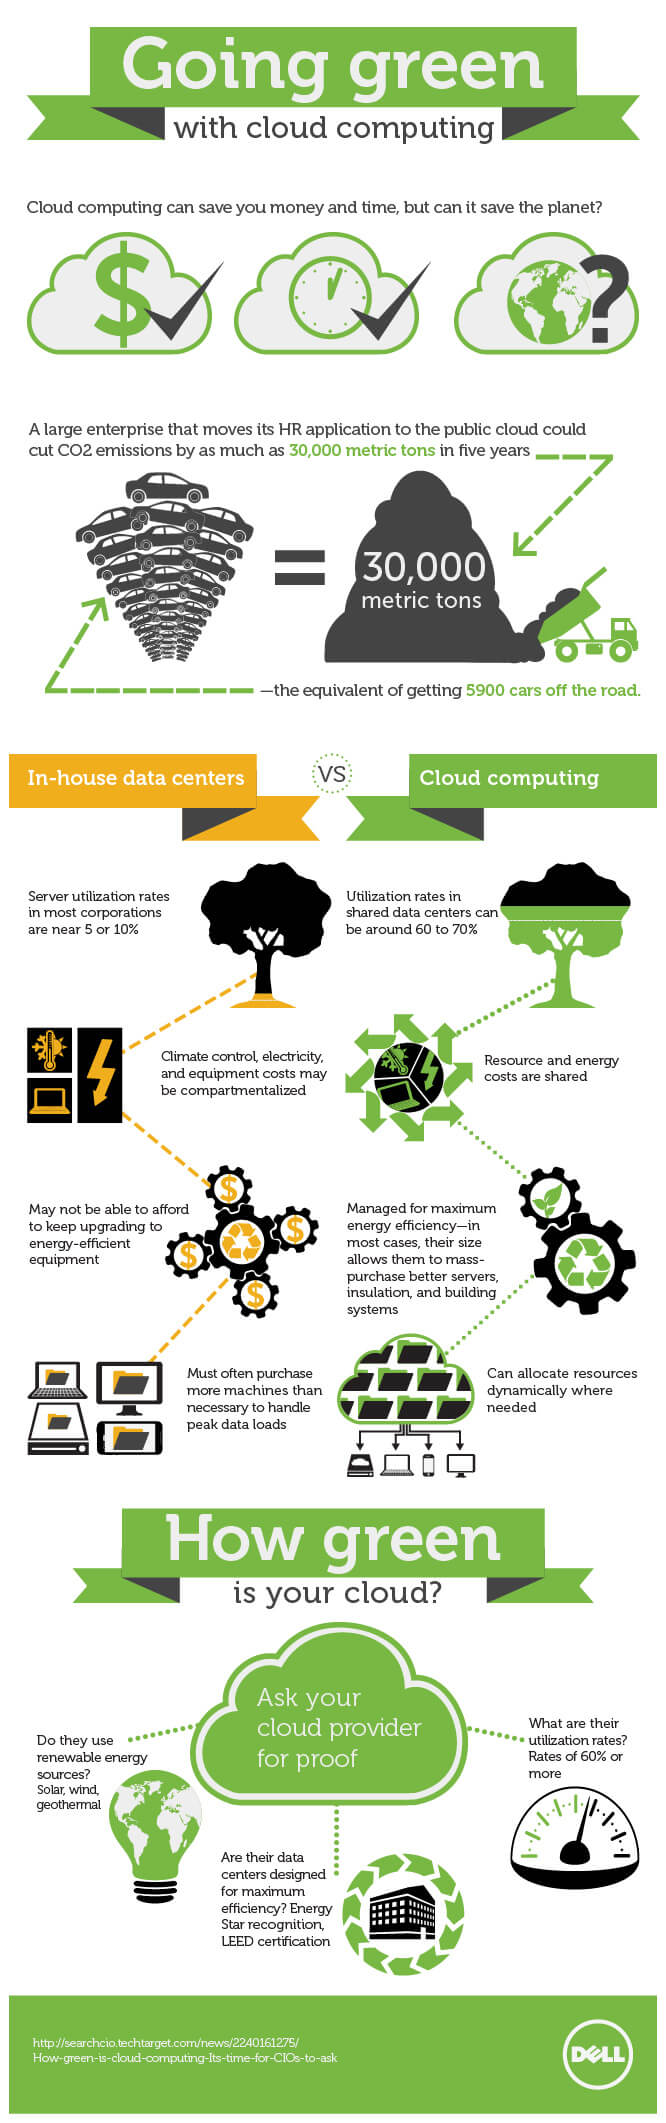 Green cloud computing infographic